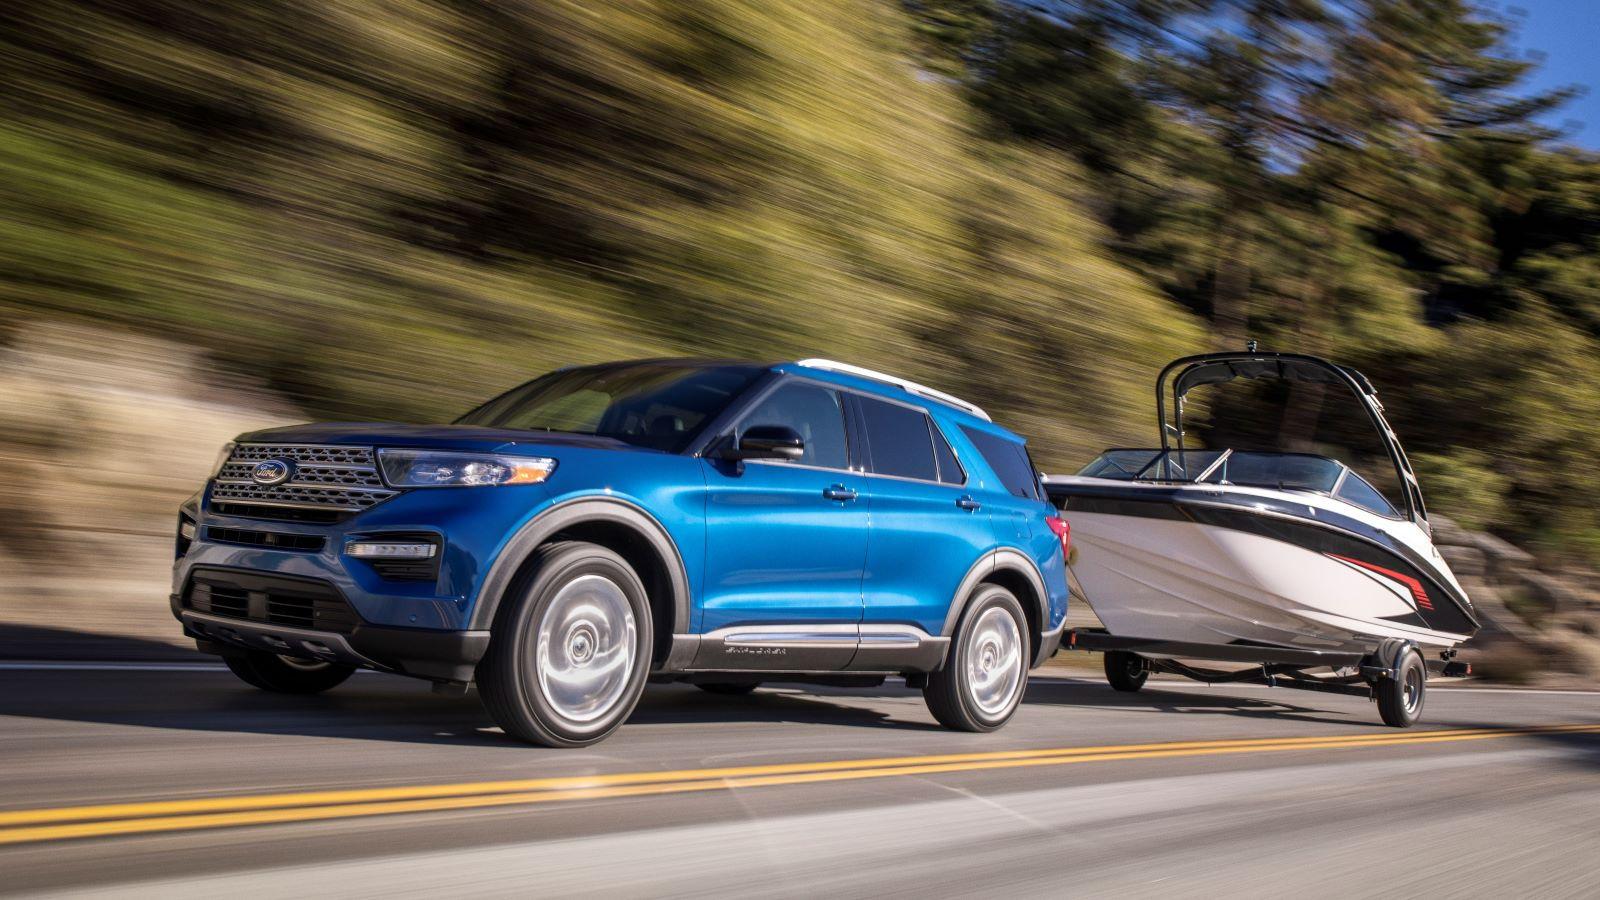 2020 Ford Explorer Hybrid Boasts 500 Mile Range